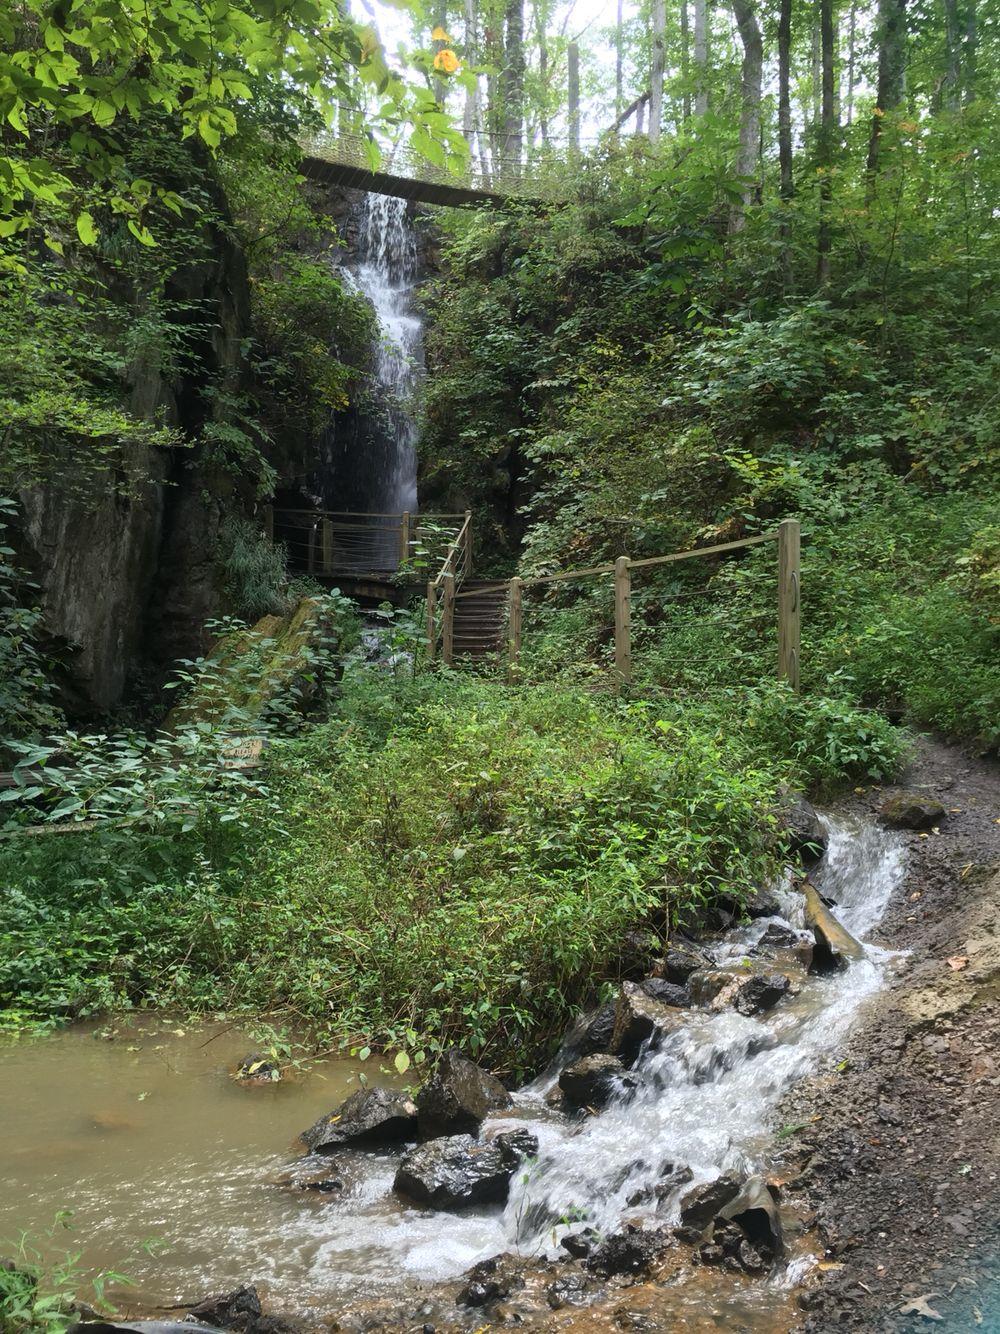 Waterfall was worth the walk